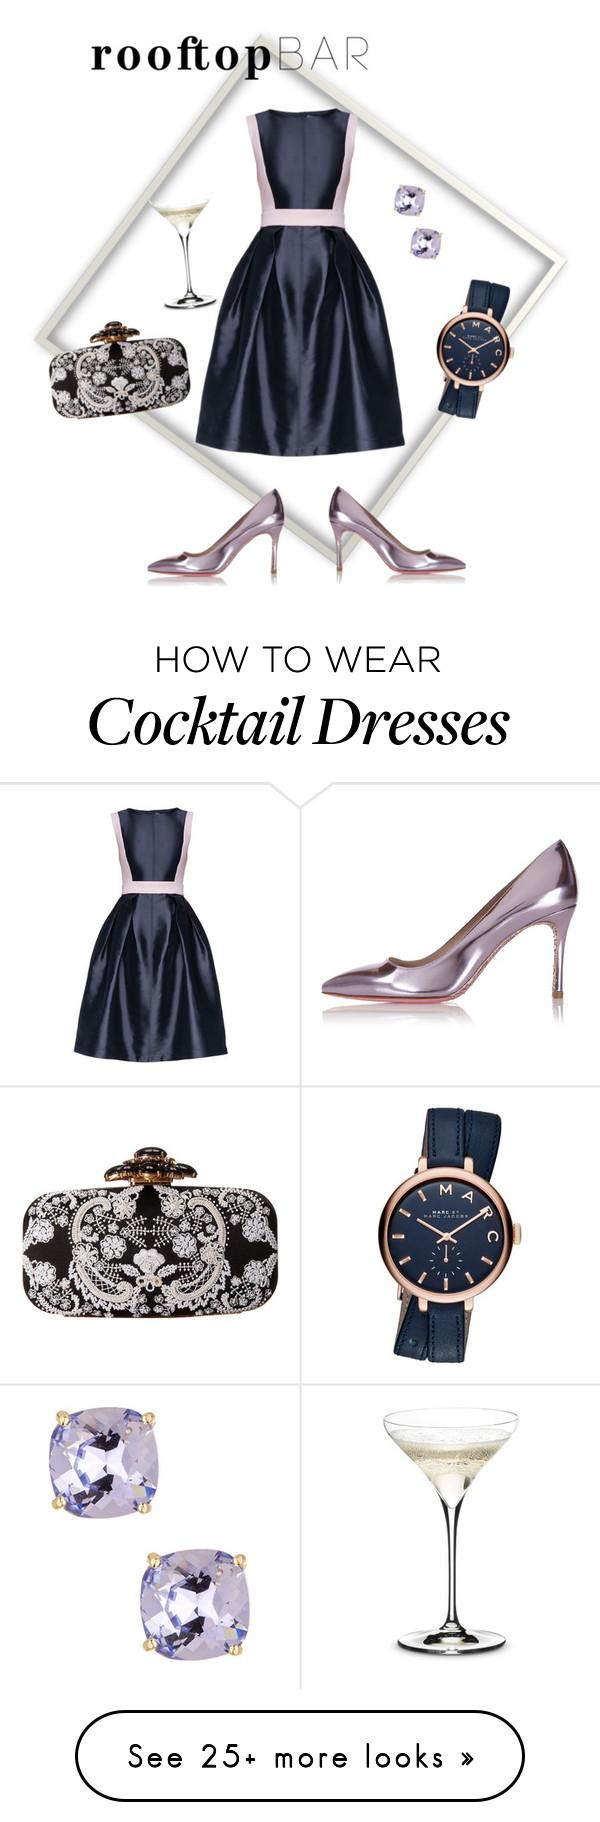 """Cocktail Dress"" by sarashafni on Polyvore featuring Lattori, Miu Miu, Candela, Marc Jacobs, Oscar de la Renta, Riedel, summerdate and rooftopbar"